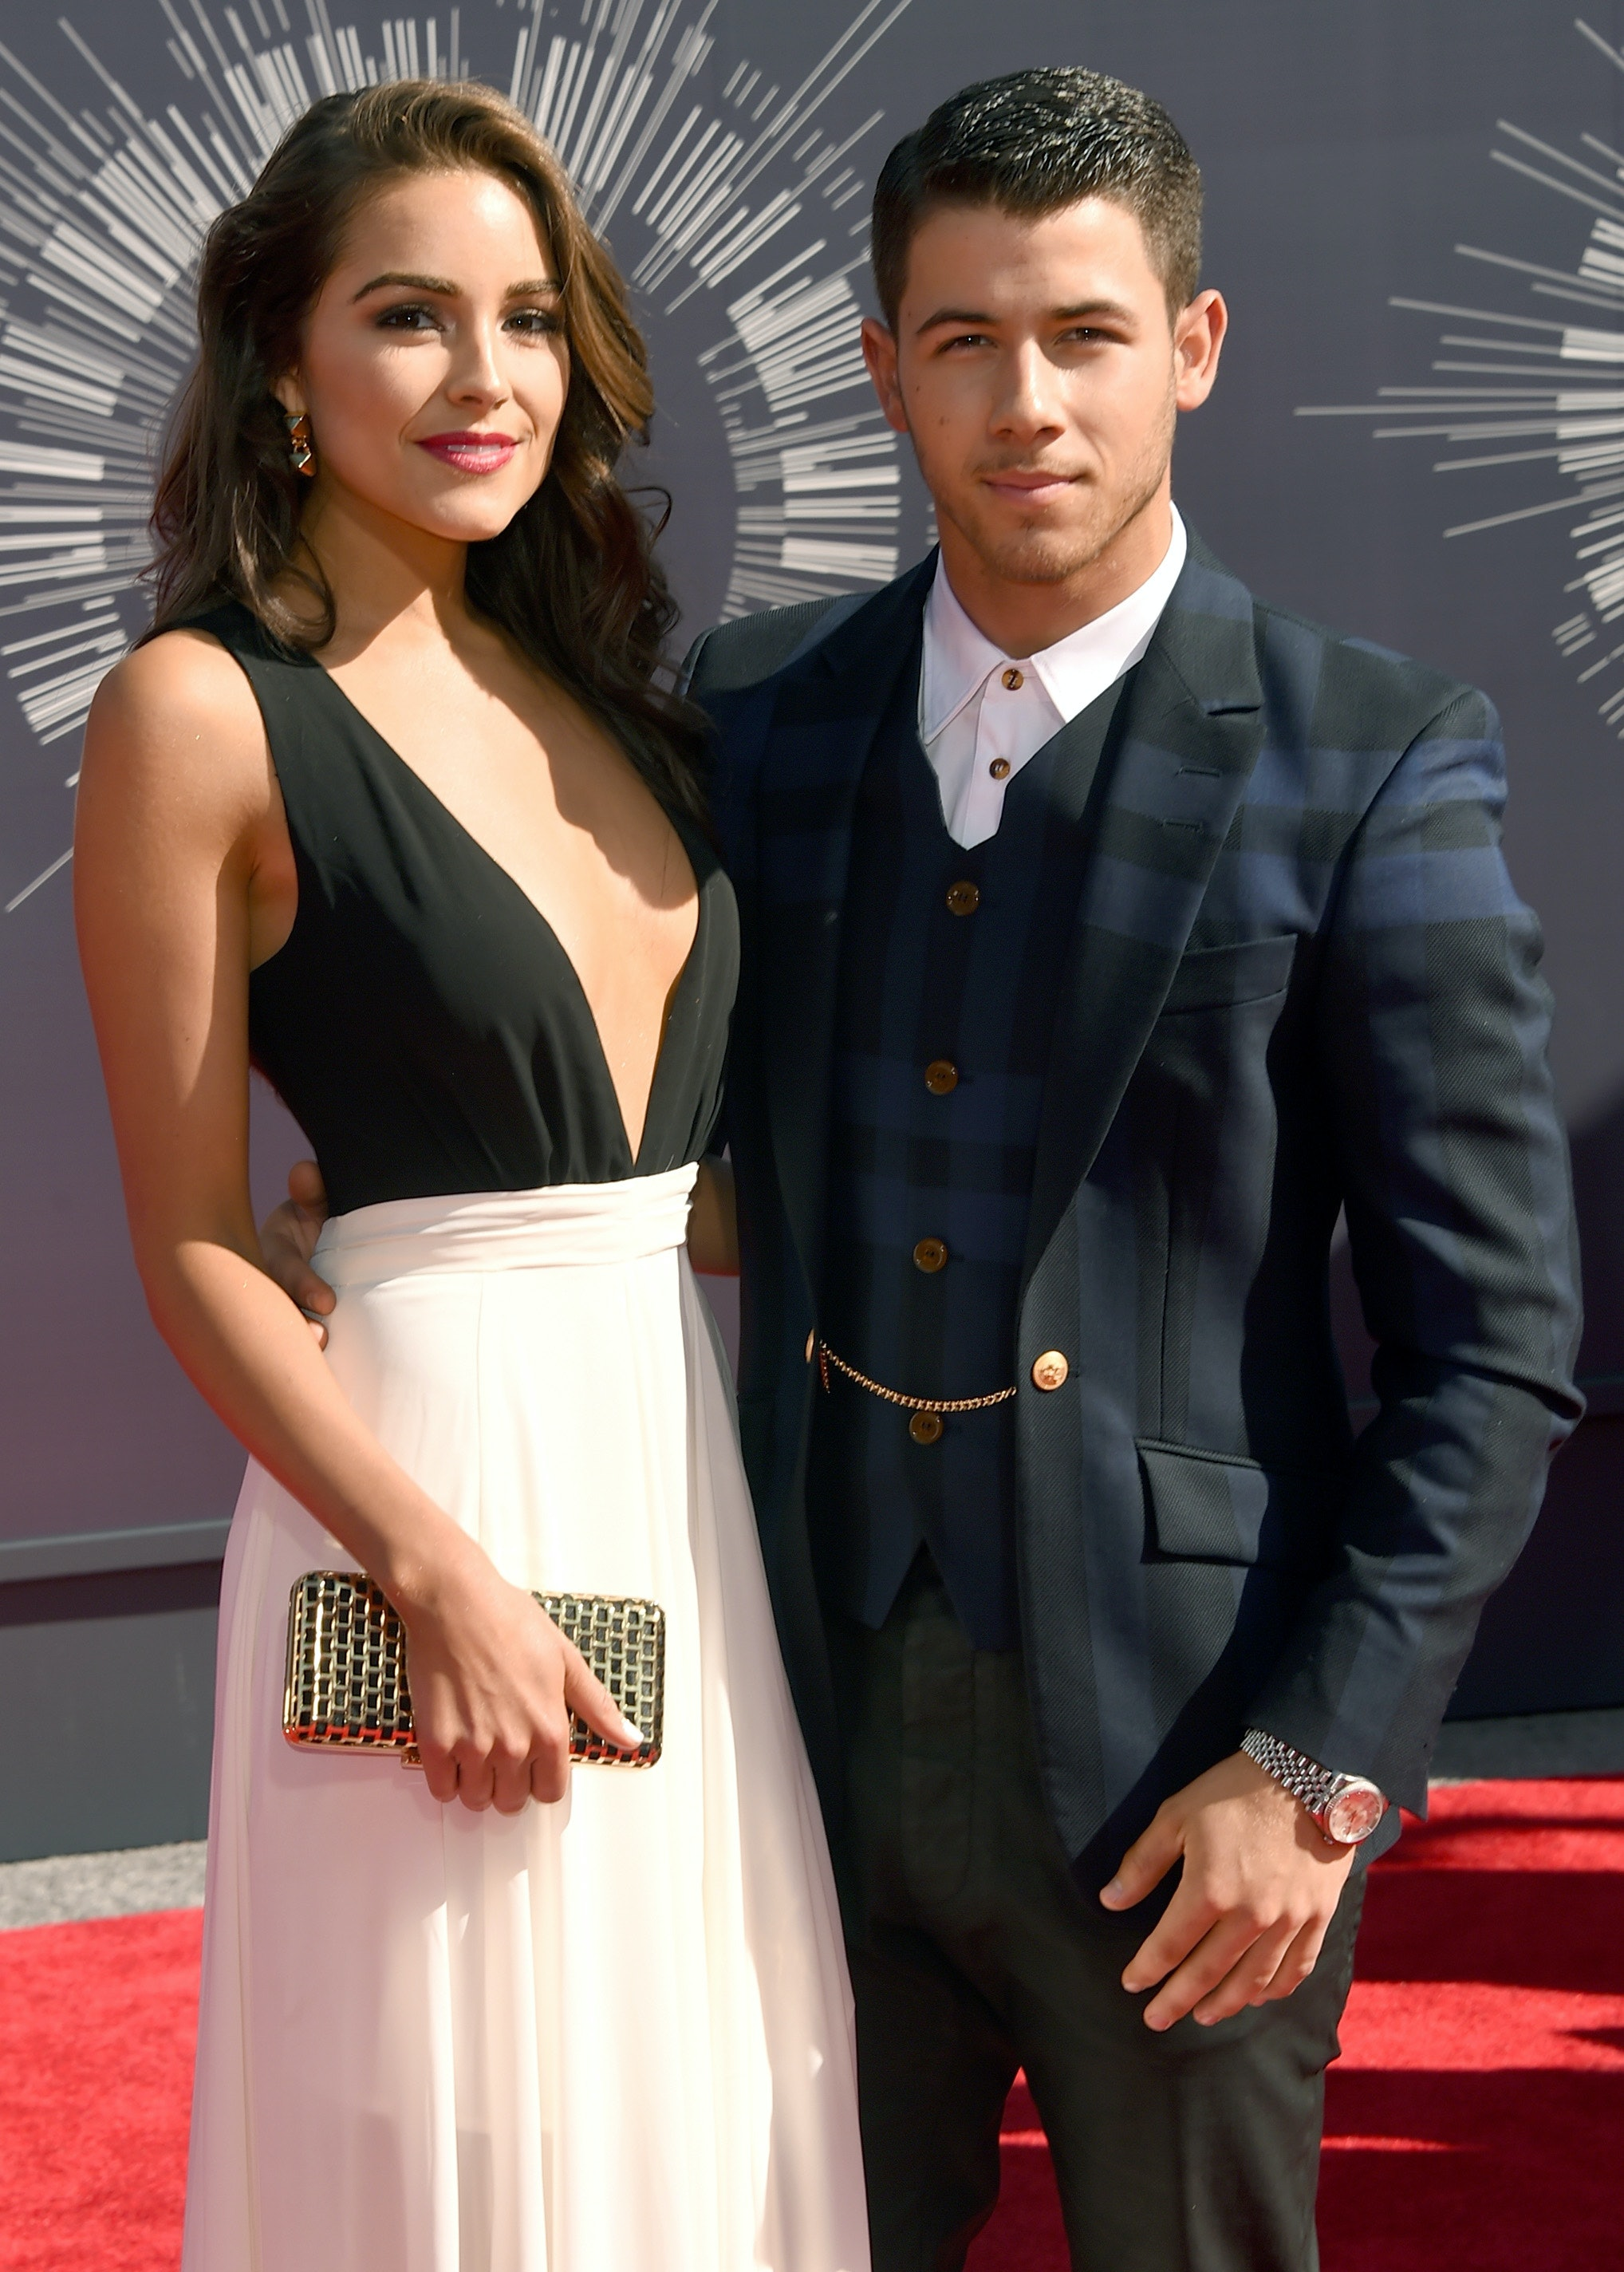 Is Miss Universe Olivia Culpo Dating Nick Jonas?